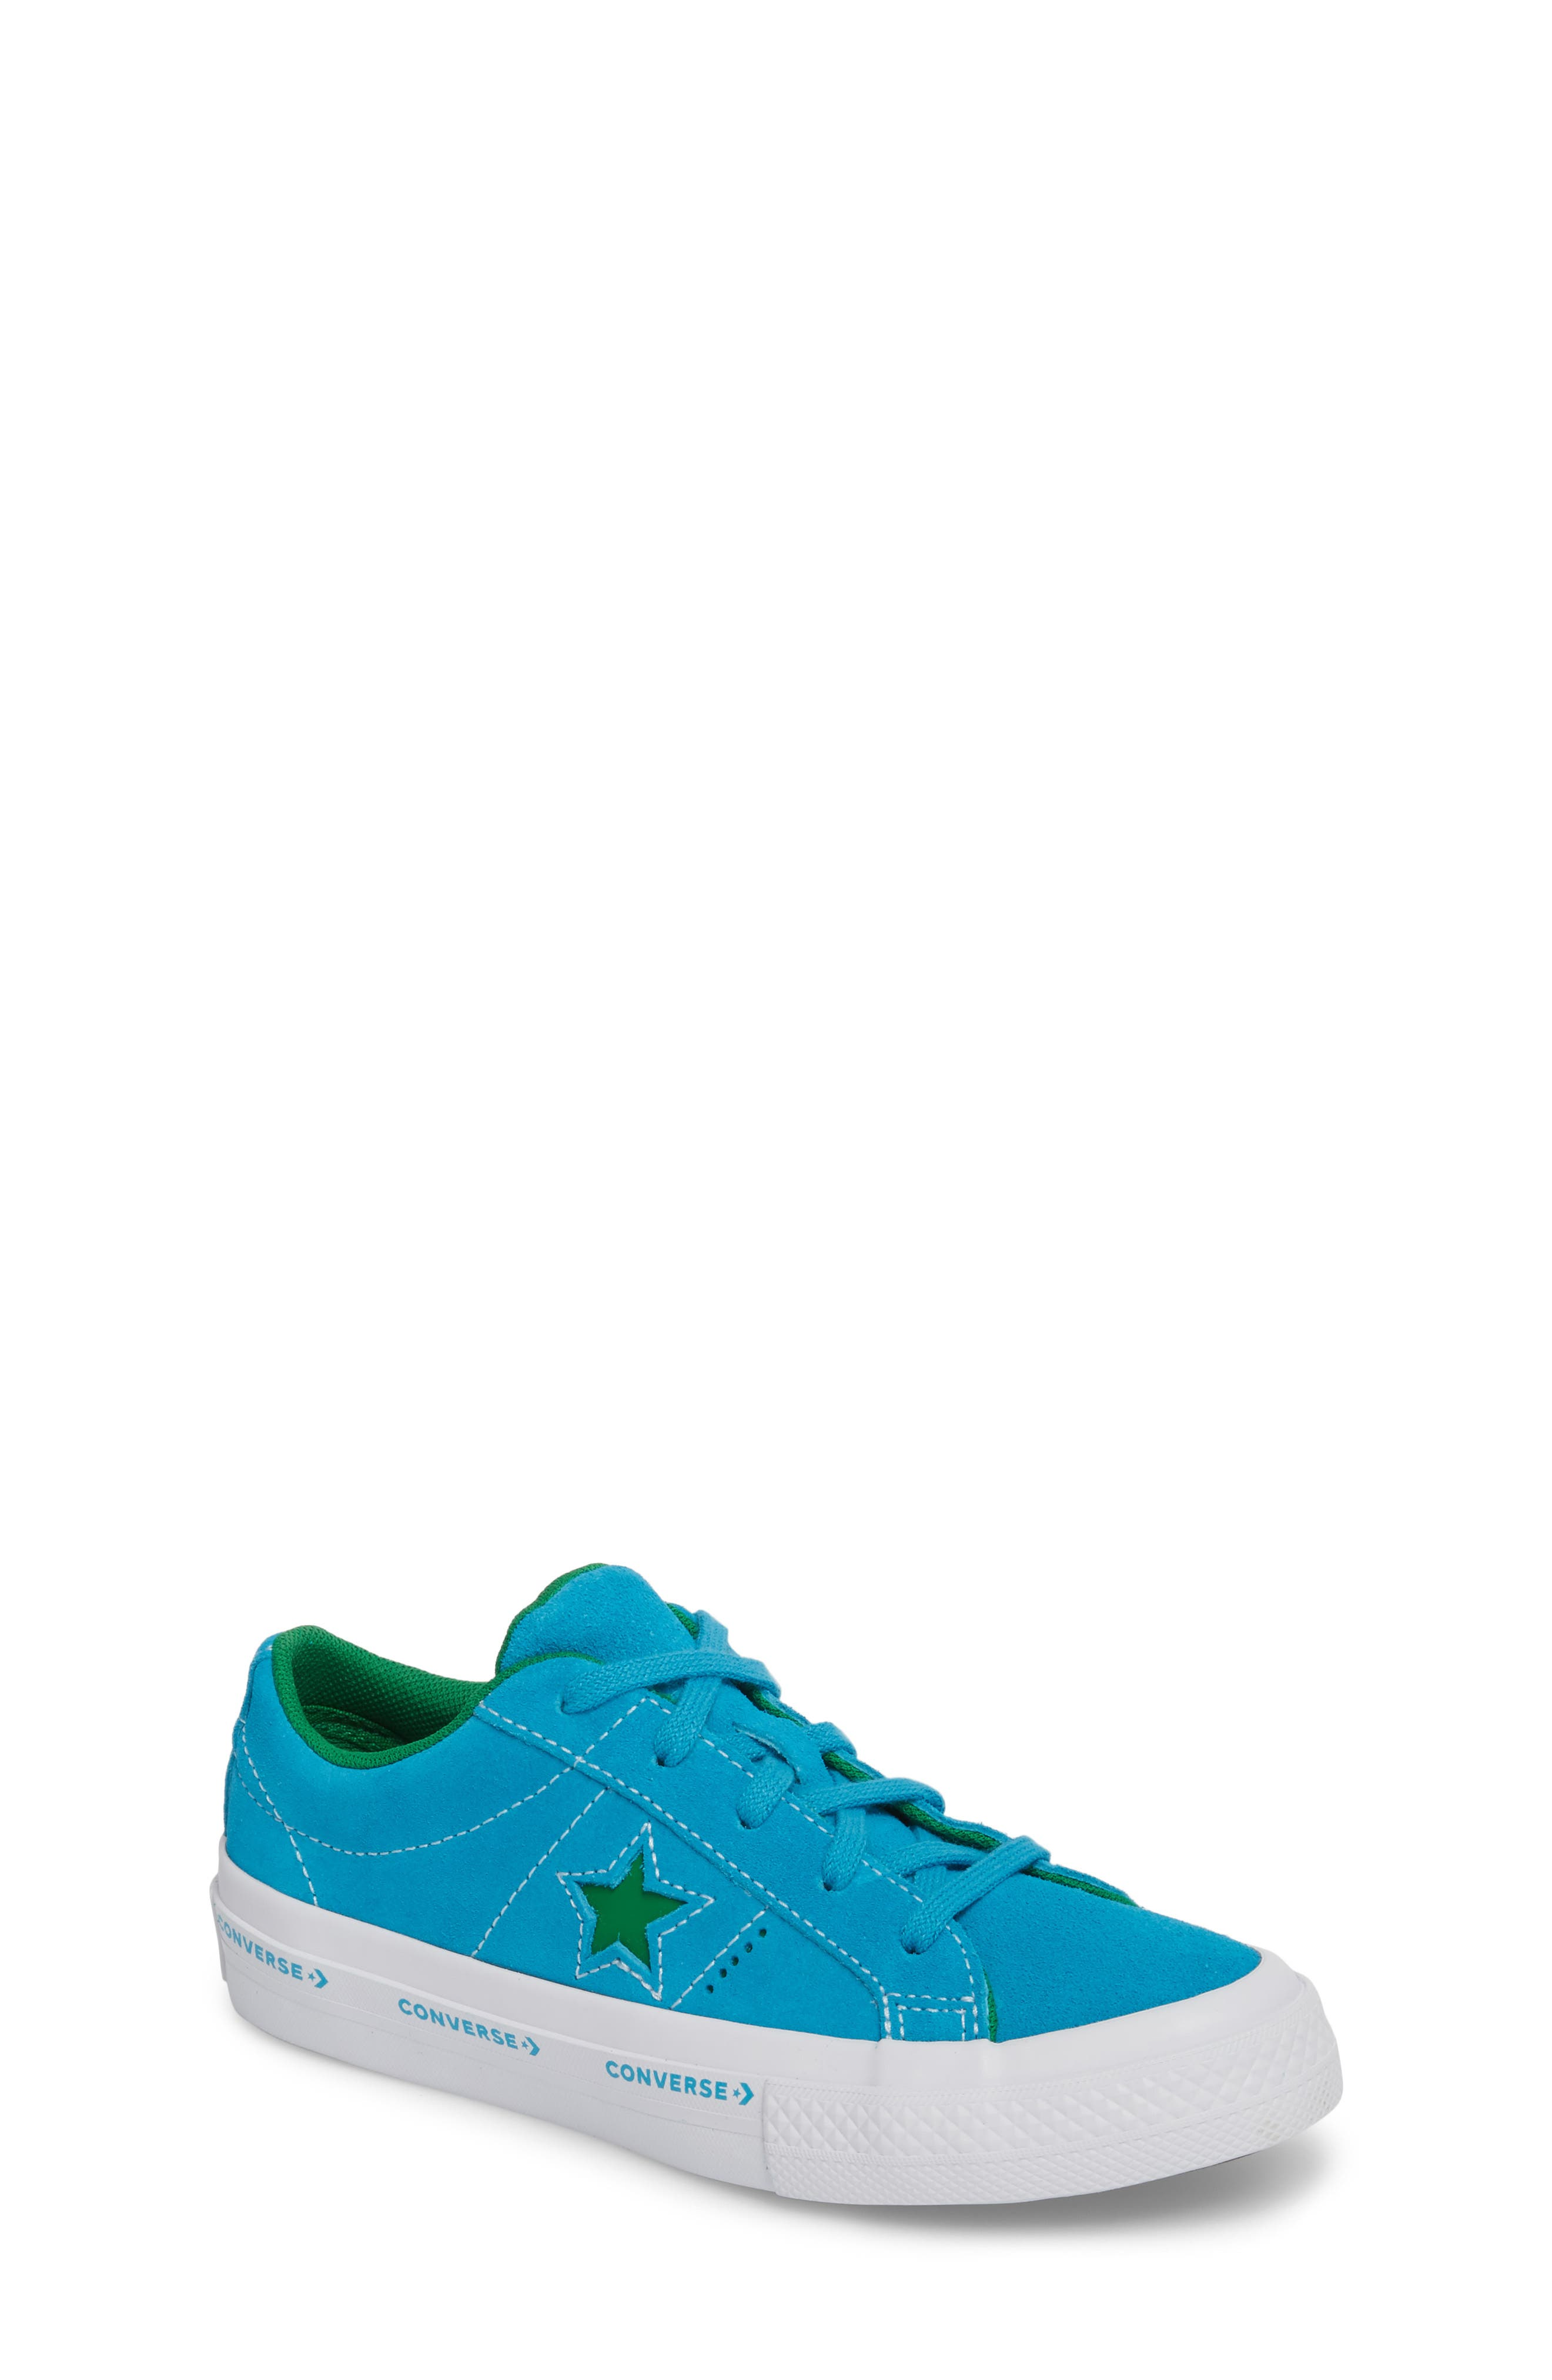 Chuck Taylor<sup>®</sup> All Star<sup>®</sup> One Star Leather Platform Sneaker,                             Main thumbnail 1, color,                             Hawaiian Ocean